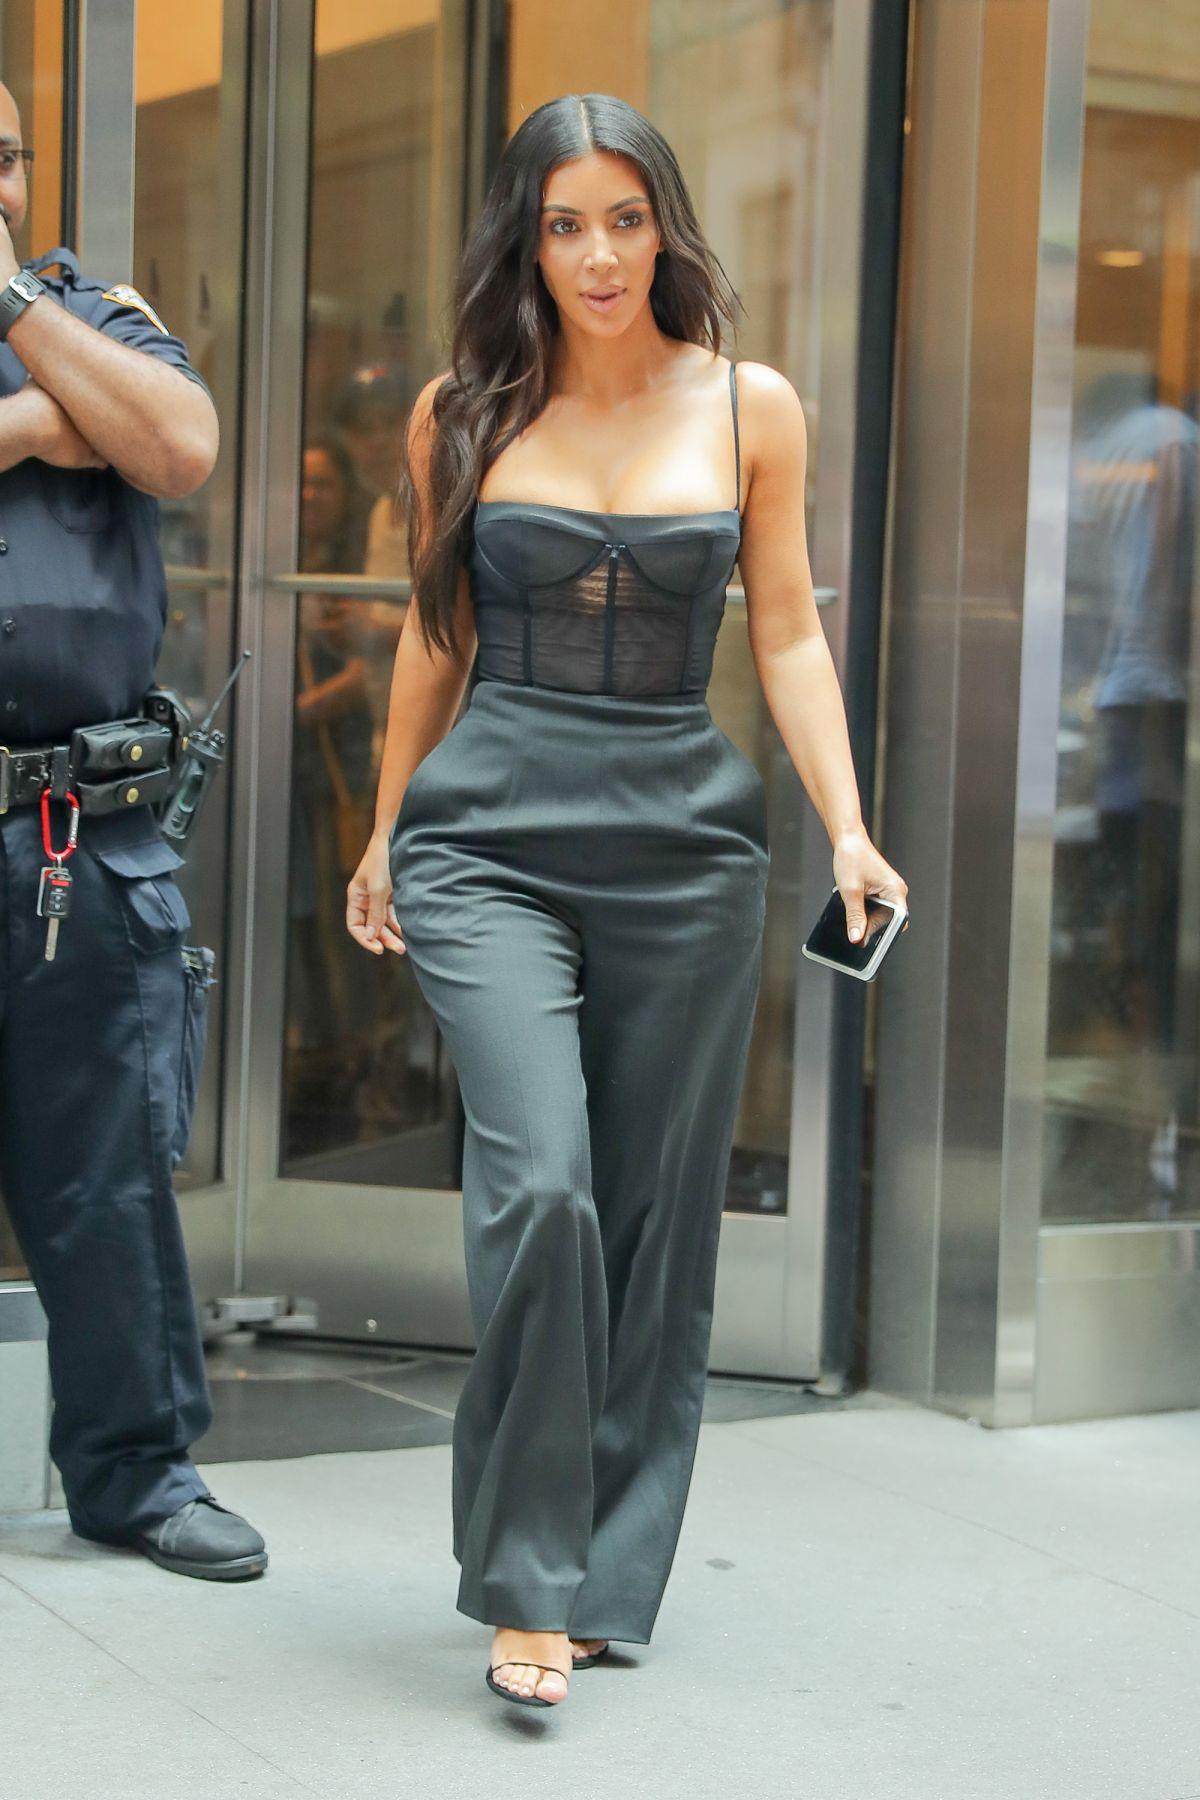 KIM KARDASHIAN Out in New York 06/14/2017 - HawtCelebs Kim Kardashian